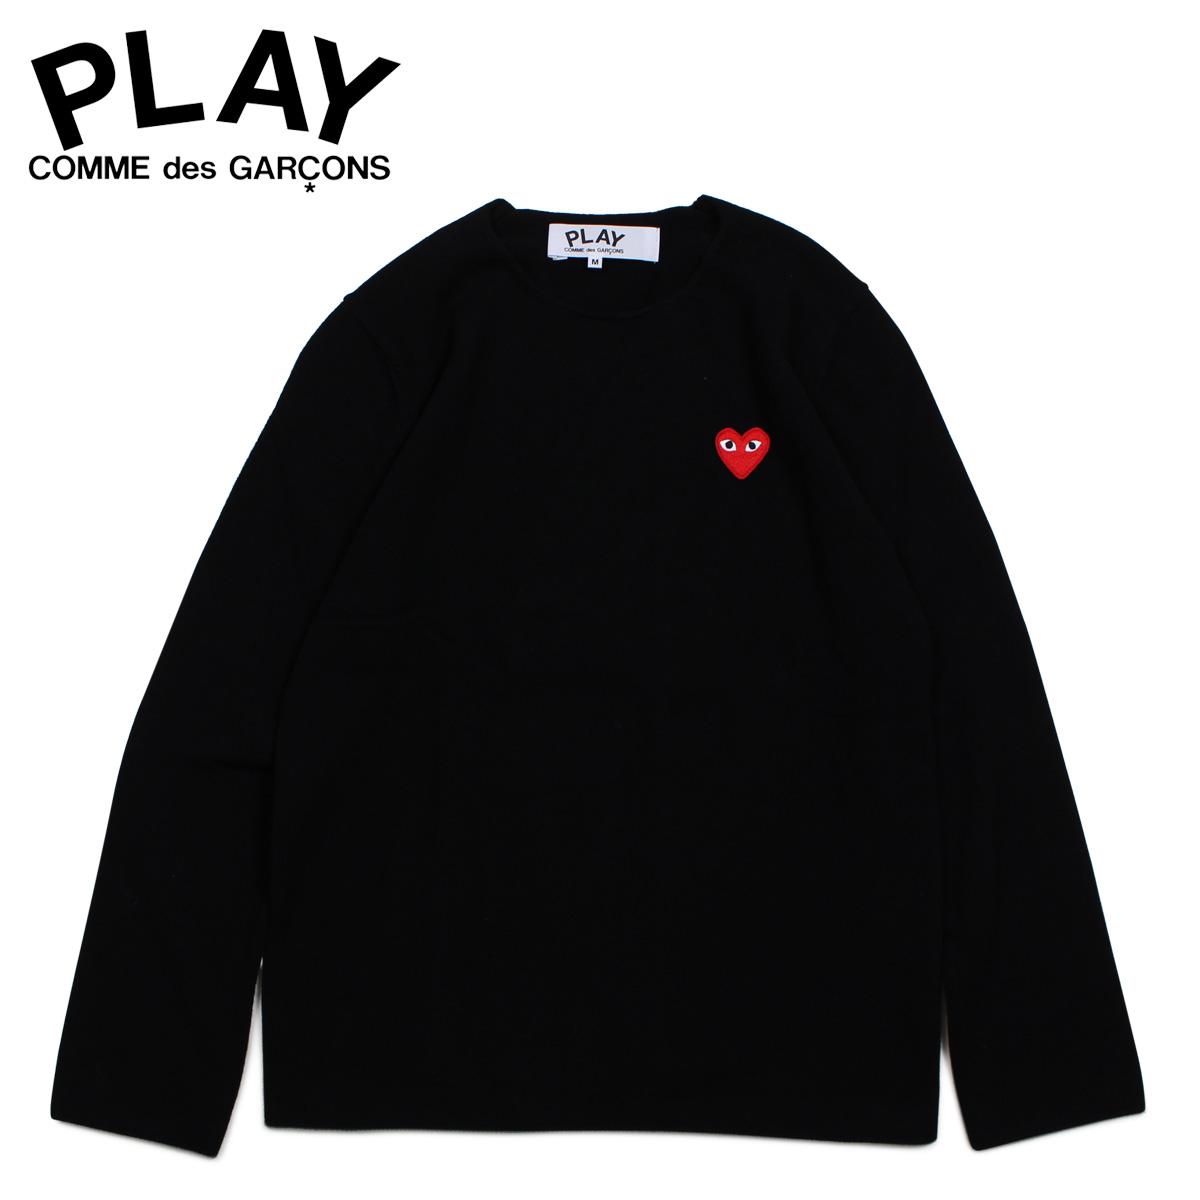 b67b5c52544a01 PLAY COMME des GARCONS コムデギャルソンニットセーターメンズ RED HEART CREW NECK SWEATER black  black AZ-N068  4 1 Shinnyu load